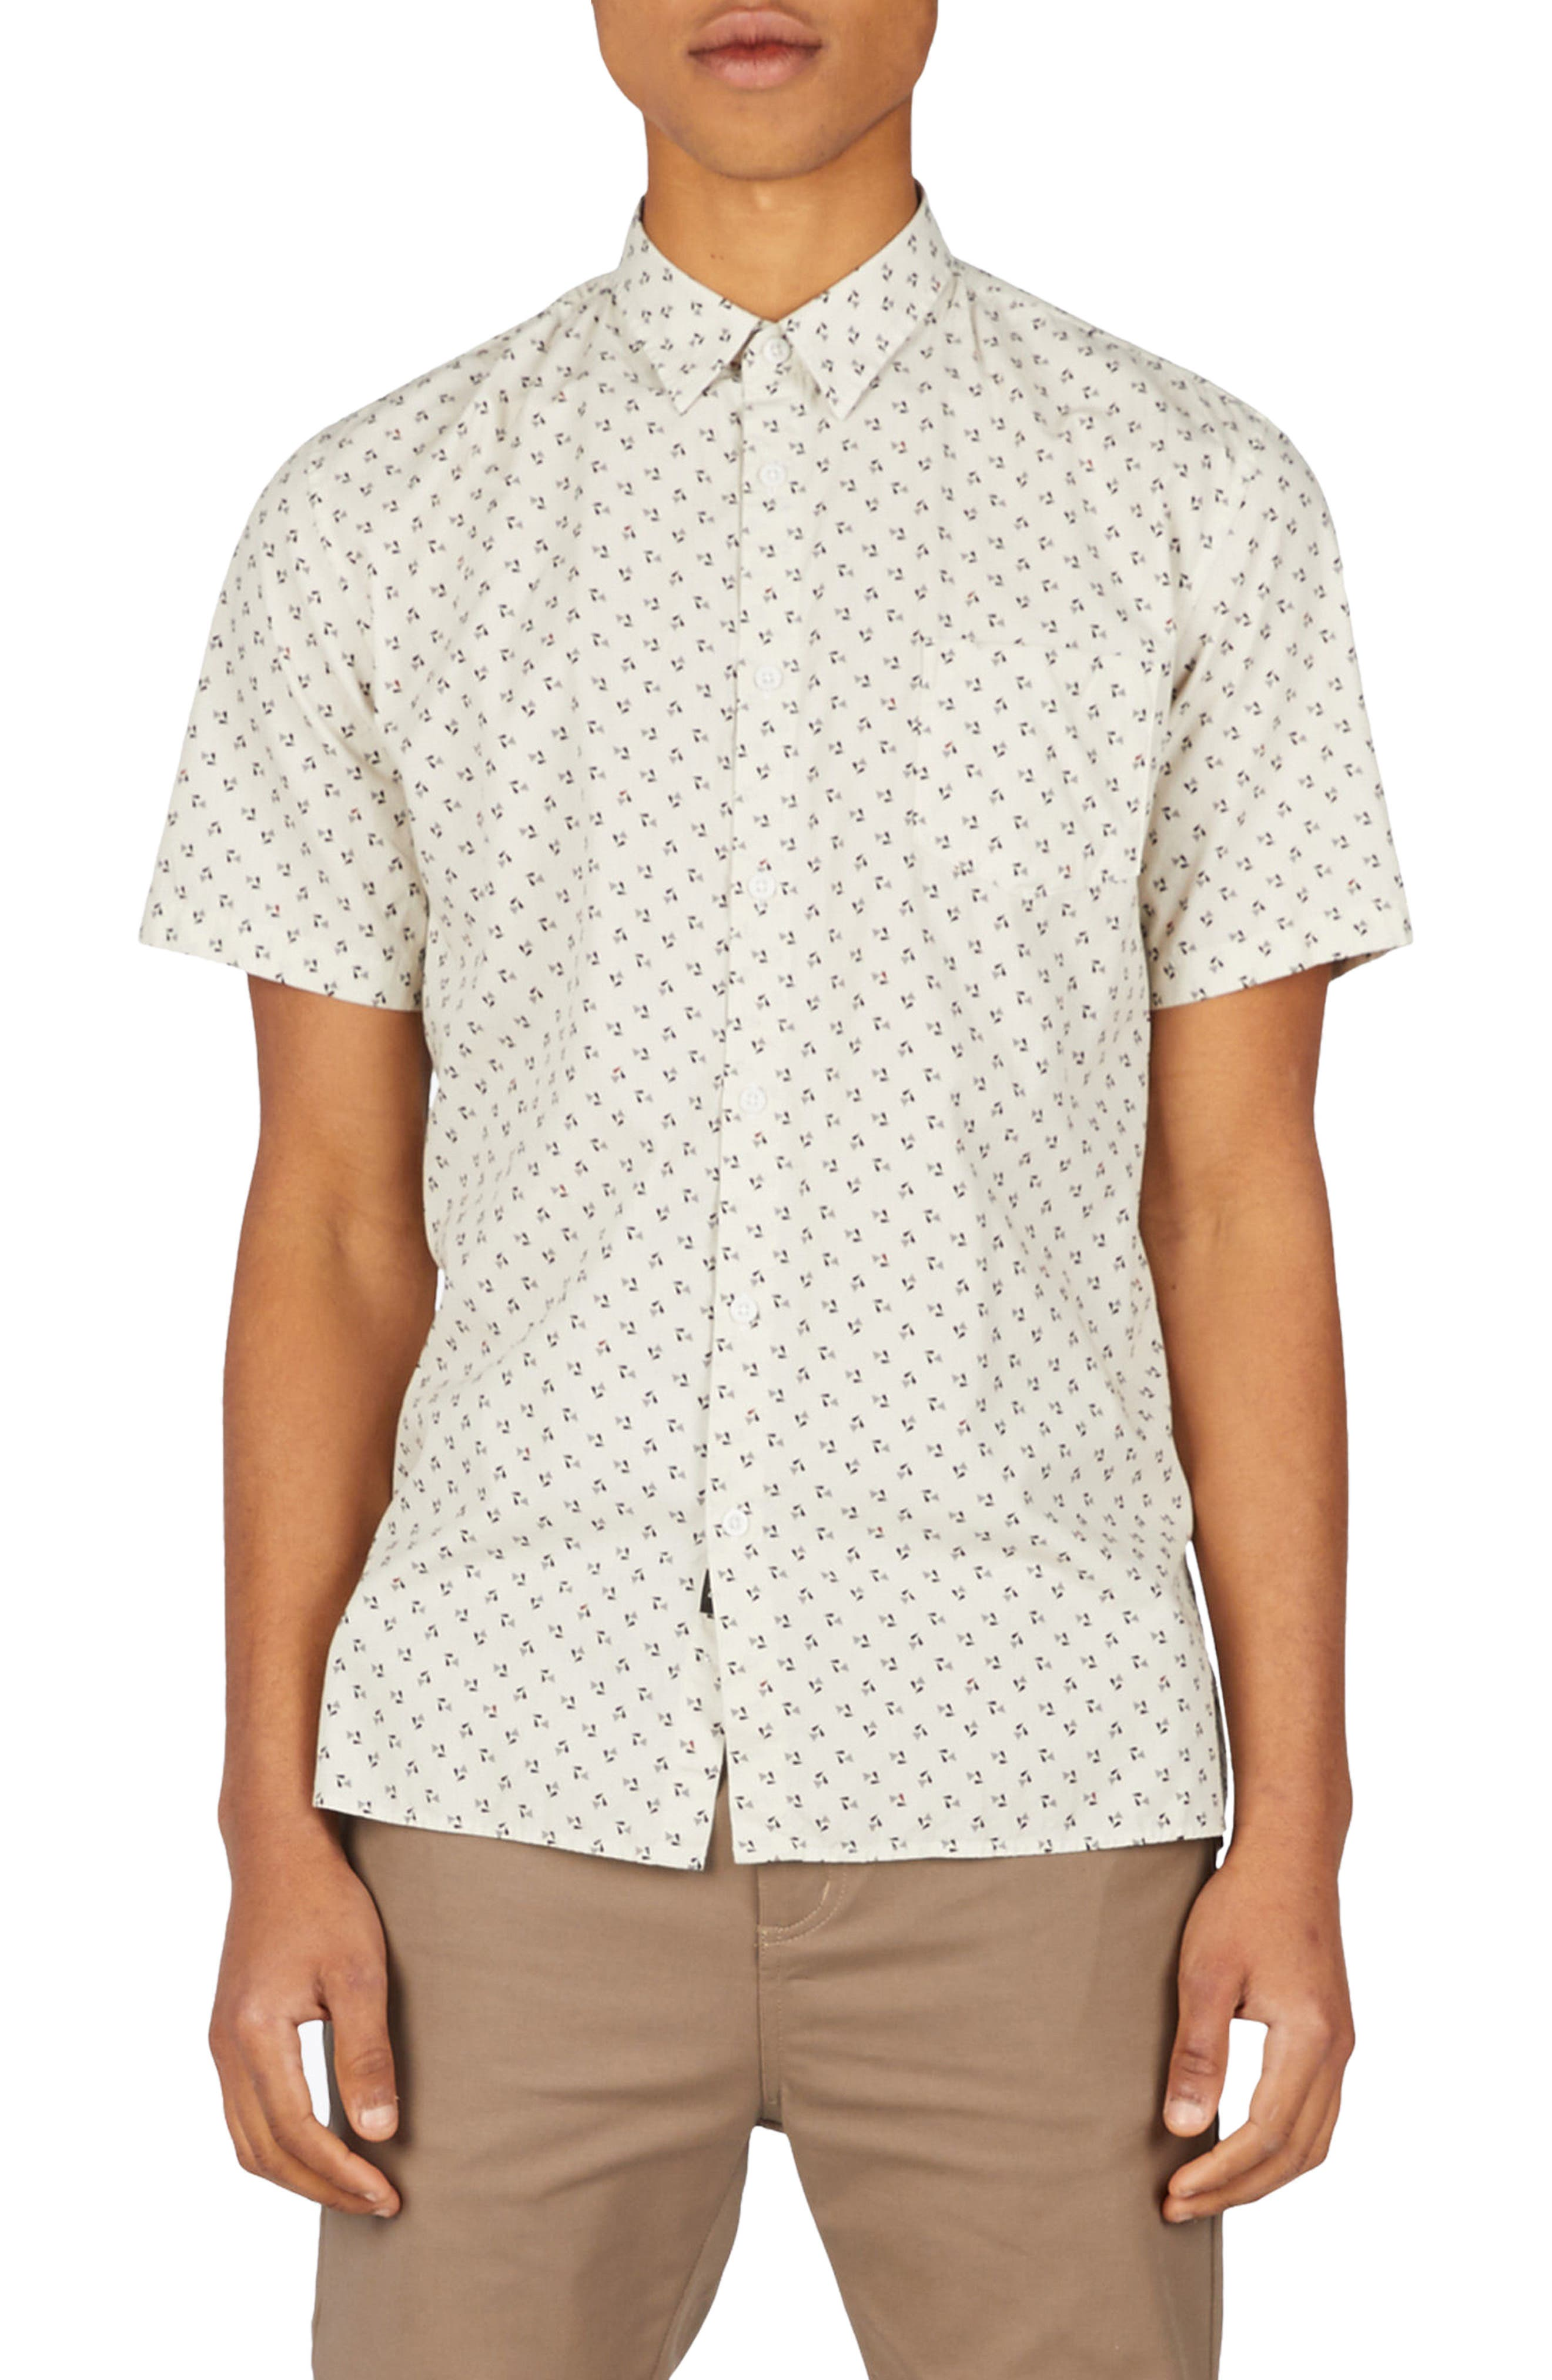 Bass Woven Shirt,                             Main thumbnail 1, color,                             900